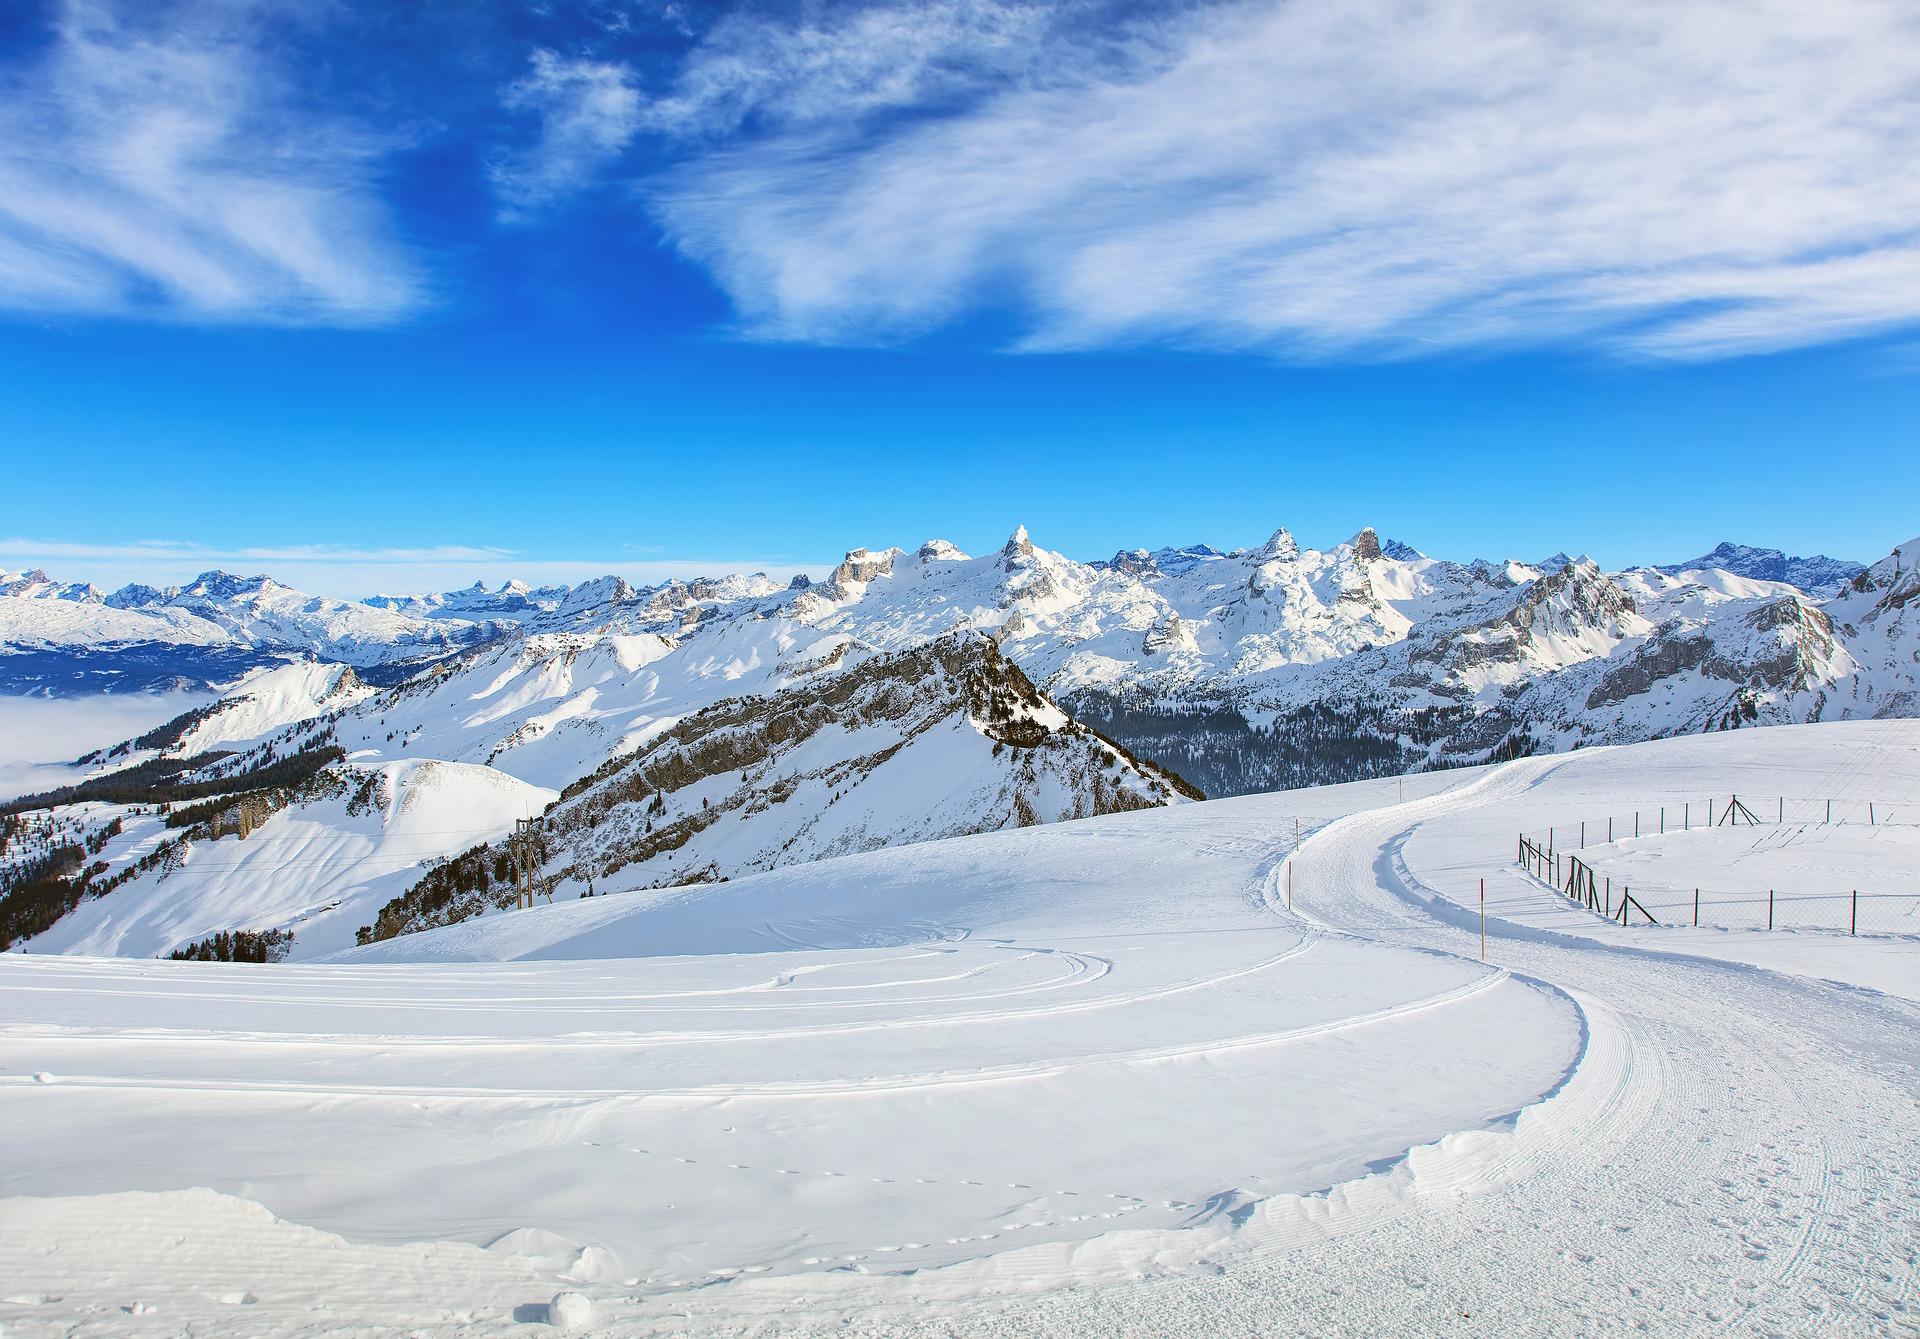 Gstaad ski resort